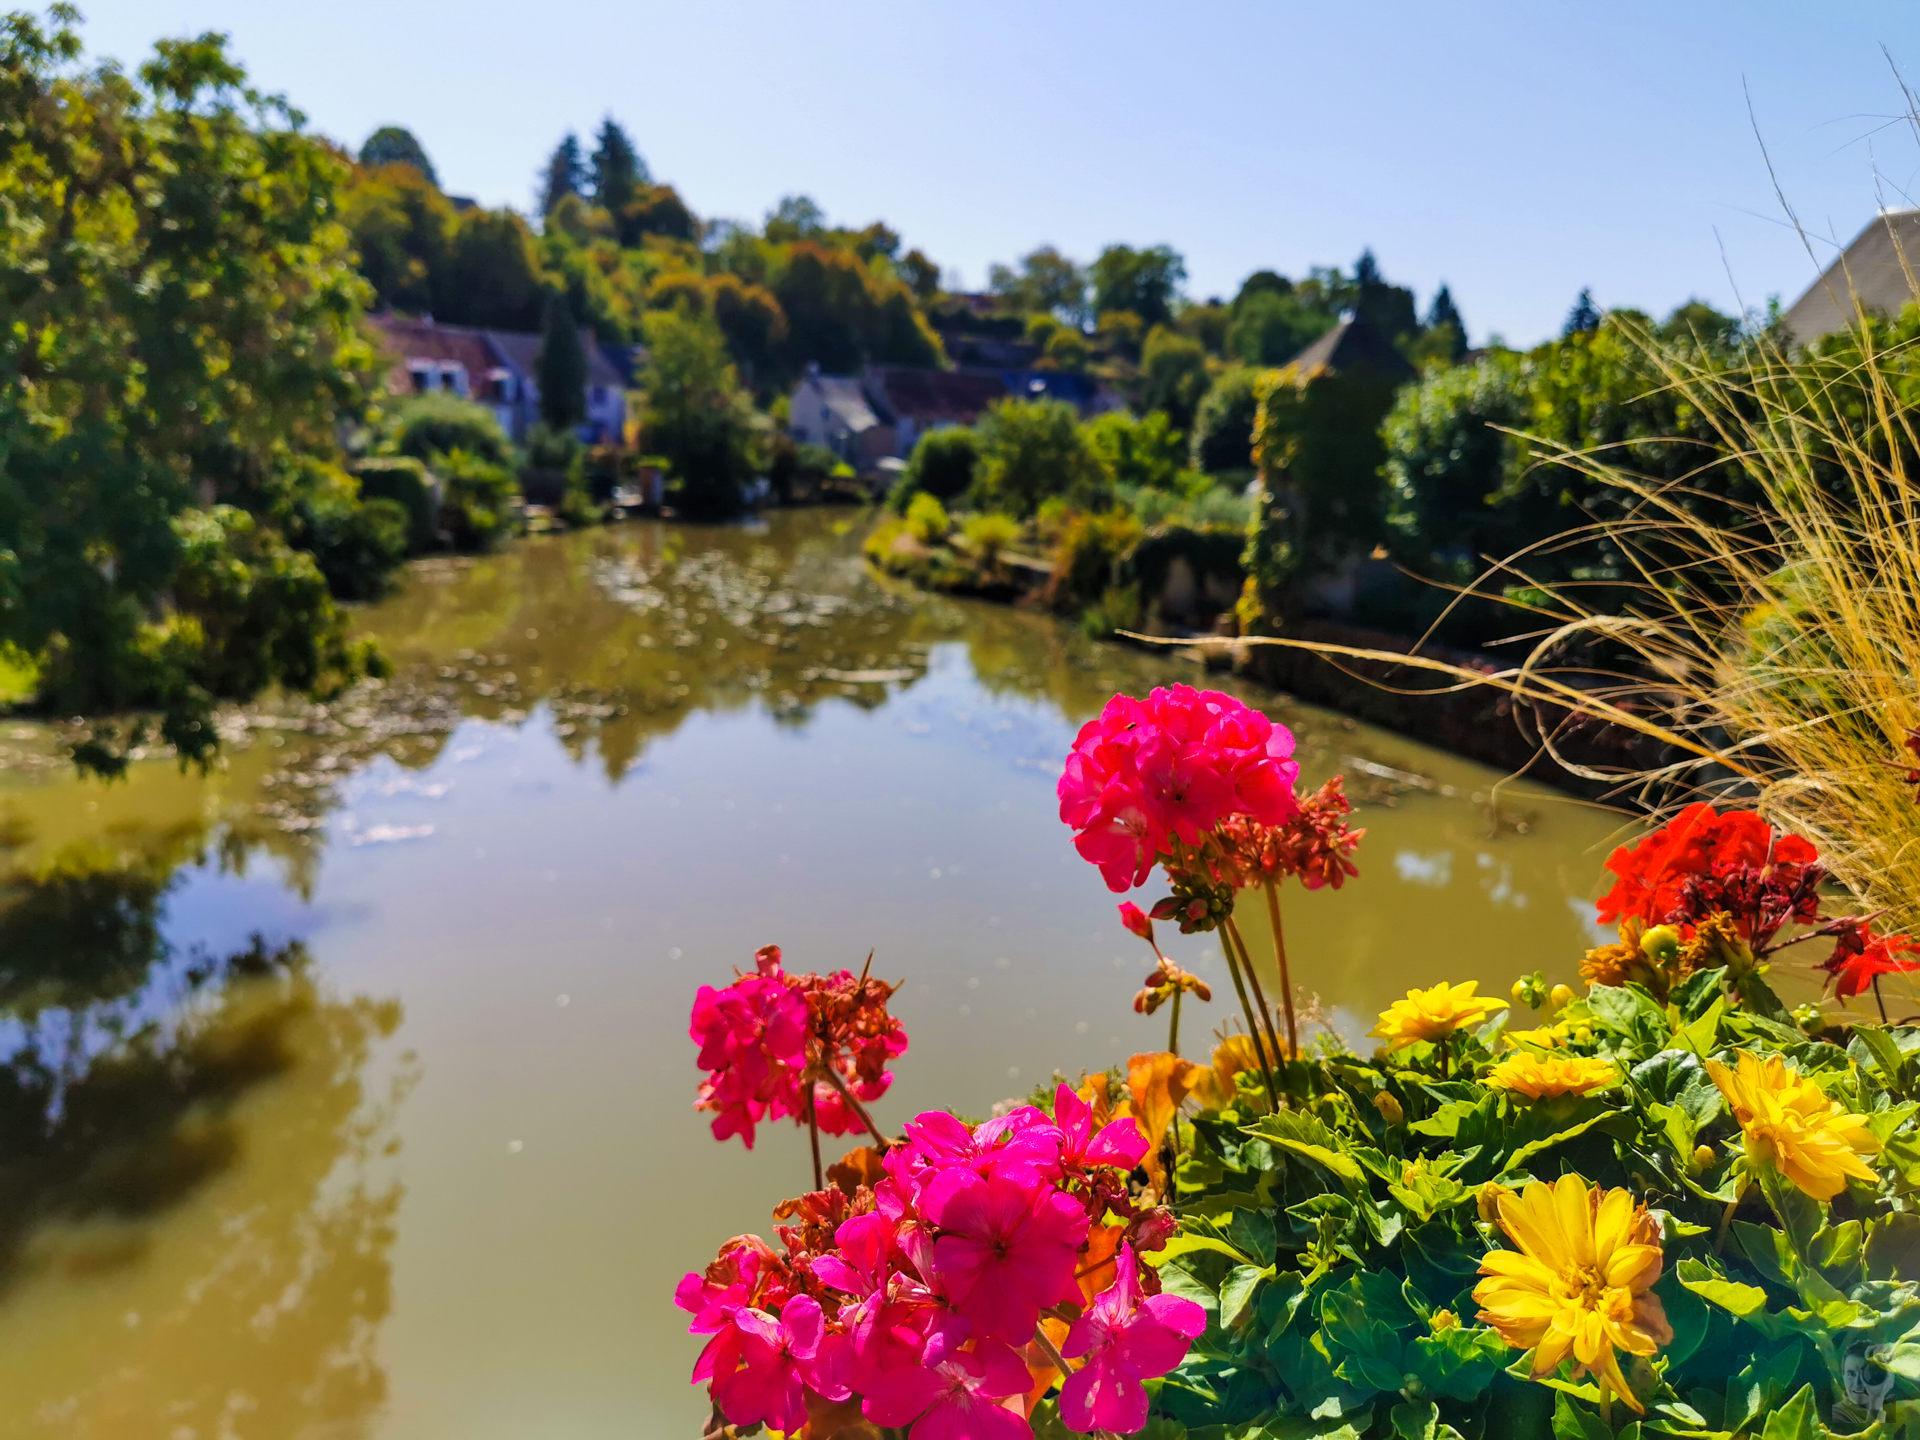 Hausbooturlaub 2019 Corbigny-Châtillon-en-Bazois